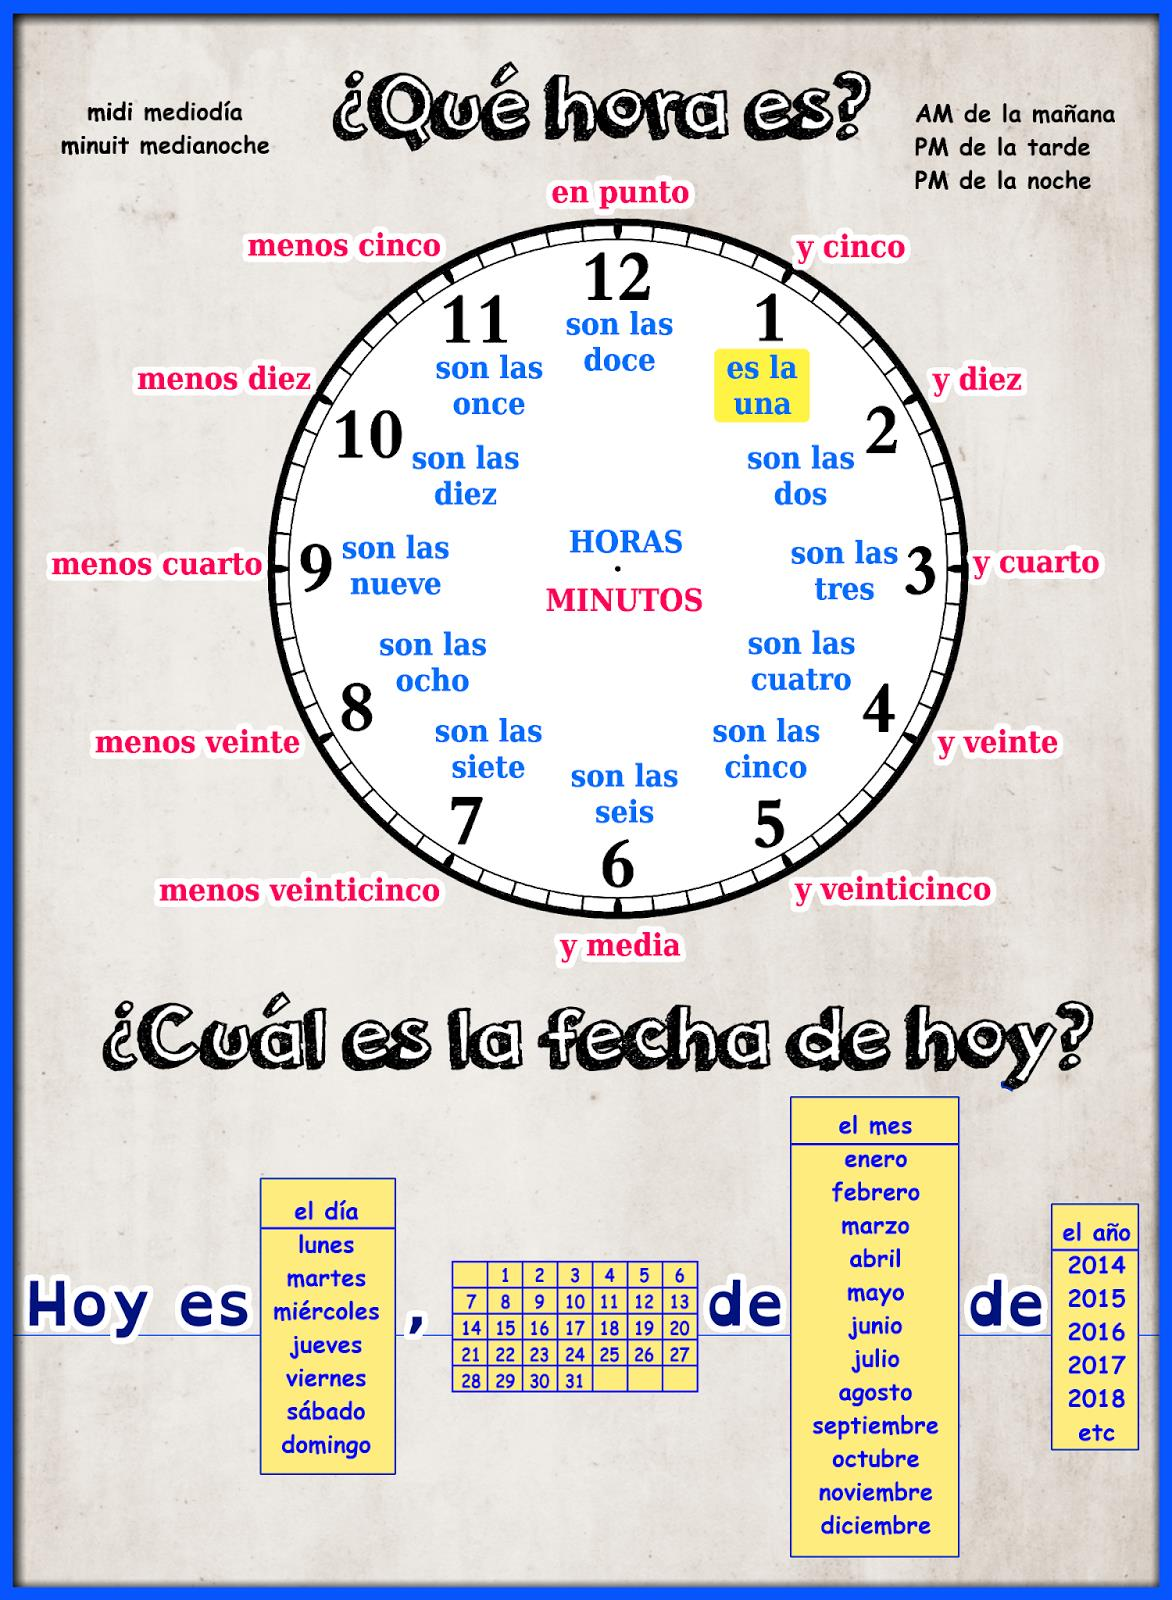 Spanish Ks3 Mfl Resources Gcse A Level Ideas And